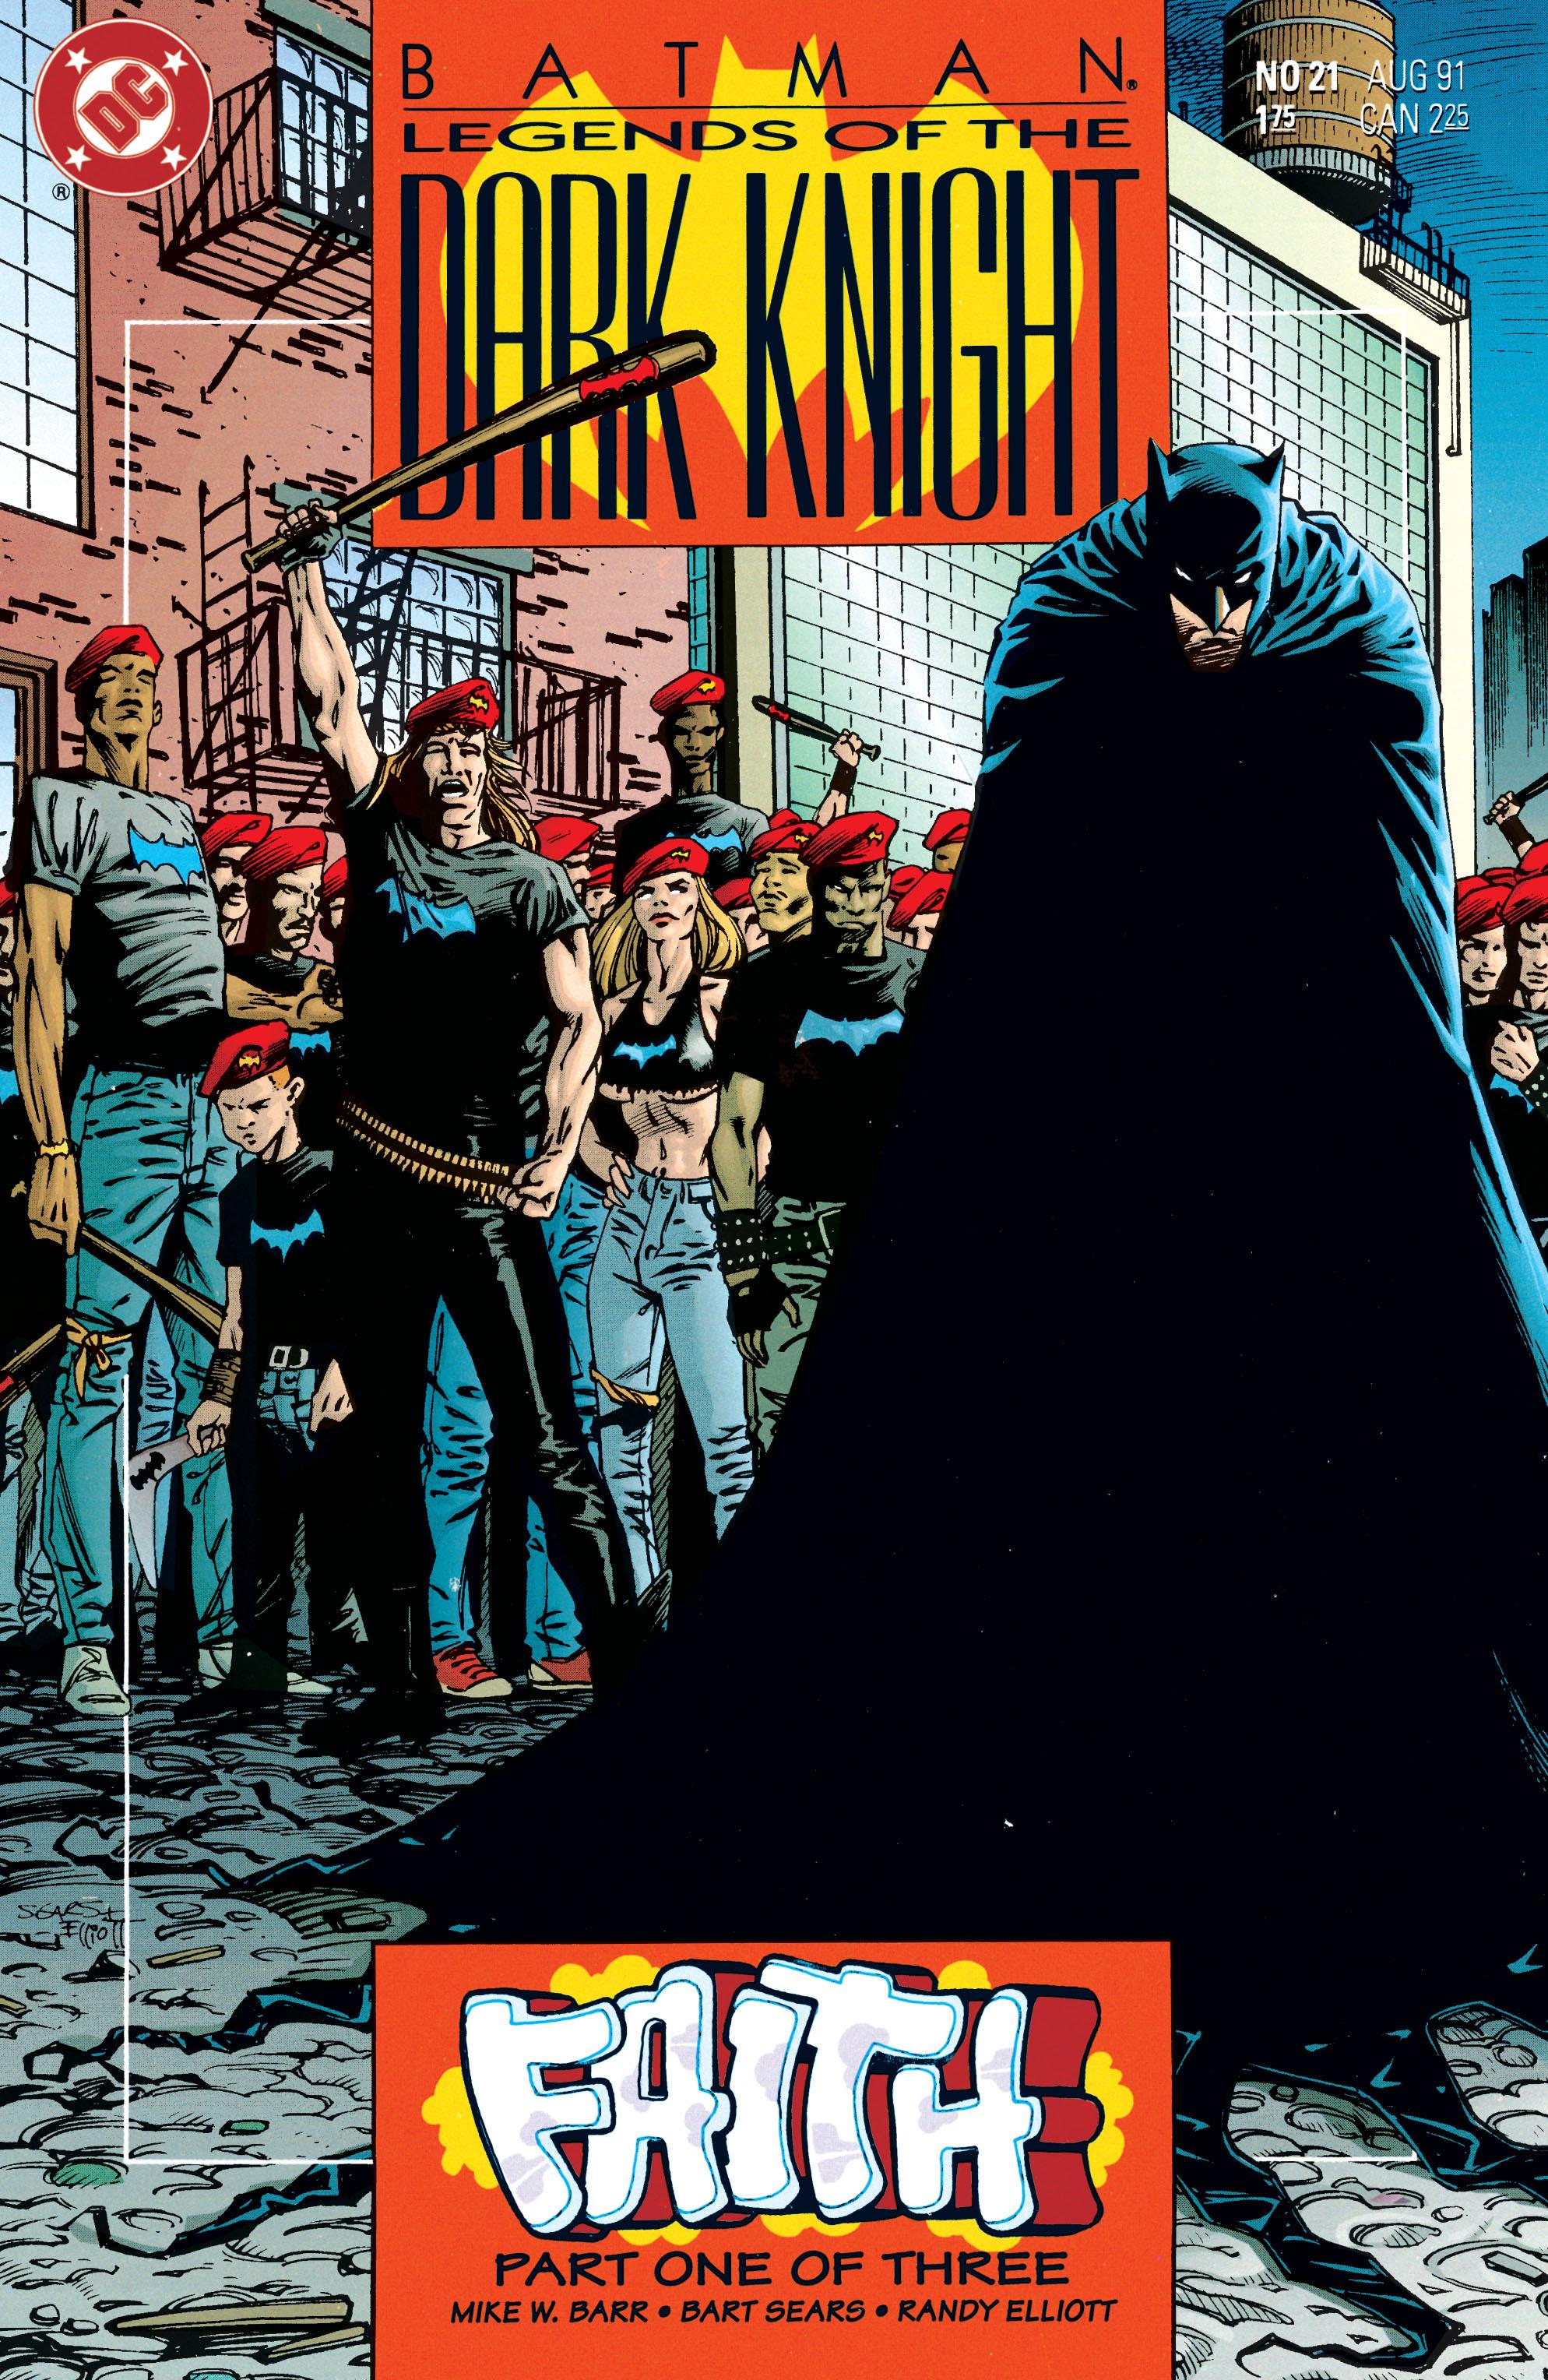 Batman: Legends of the Dark Knight 21 Page 1